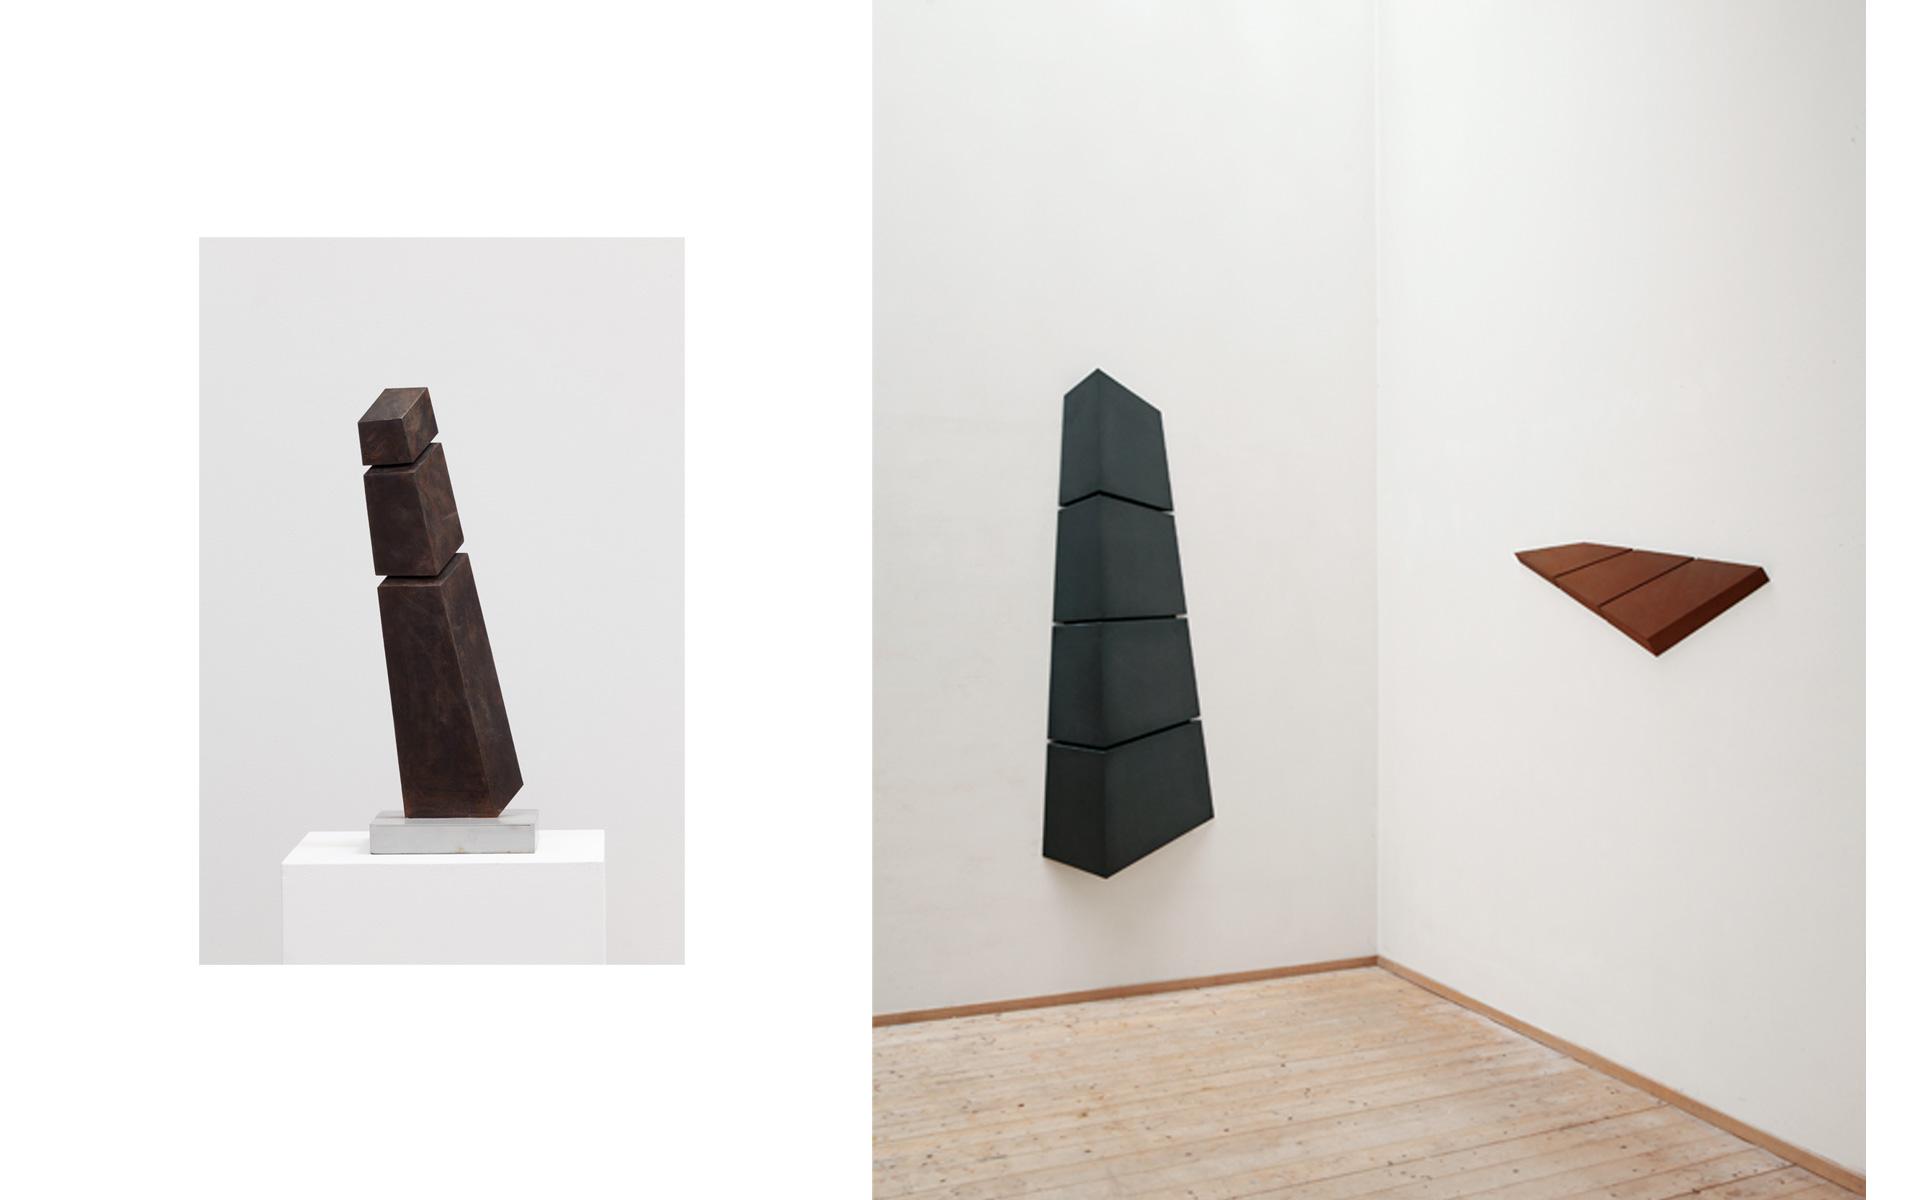 left: above: TURM, 2007 Steel 58.6 × 13.5 × 3.2 cm / right: Installation view studio, 2006 - Photos: Christoph Valentien